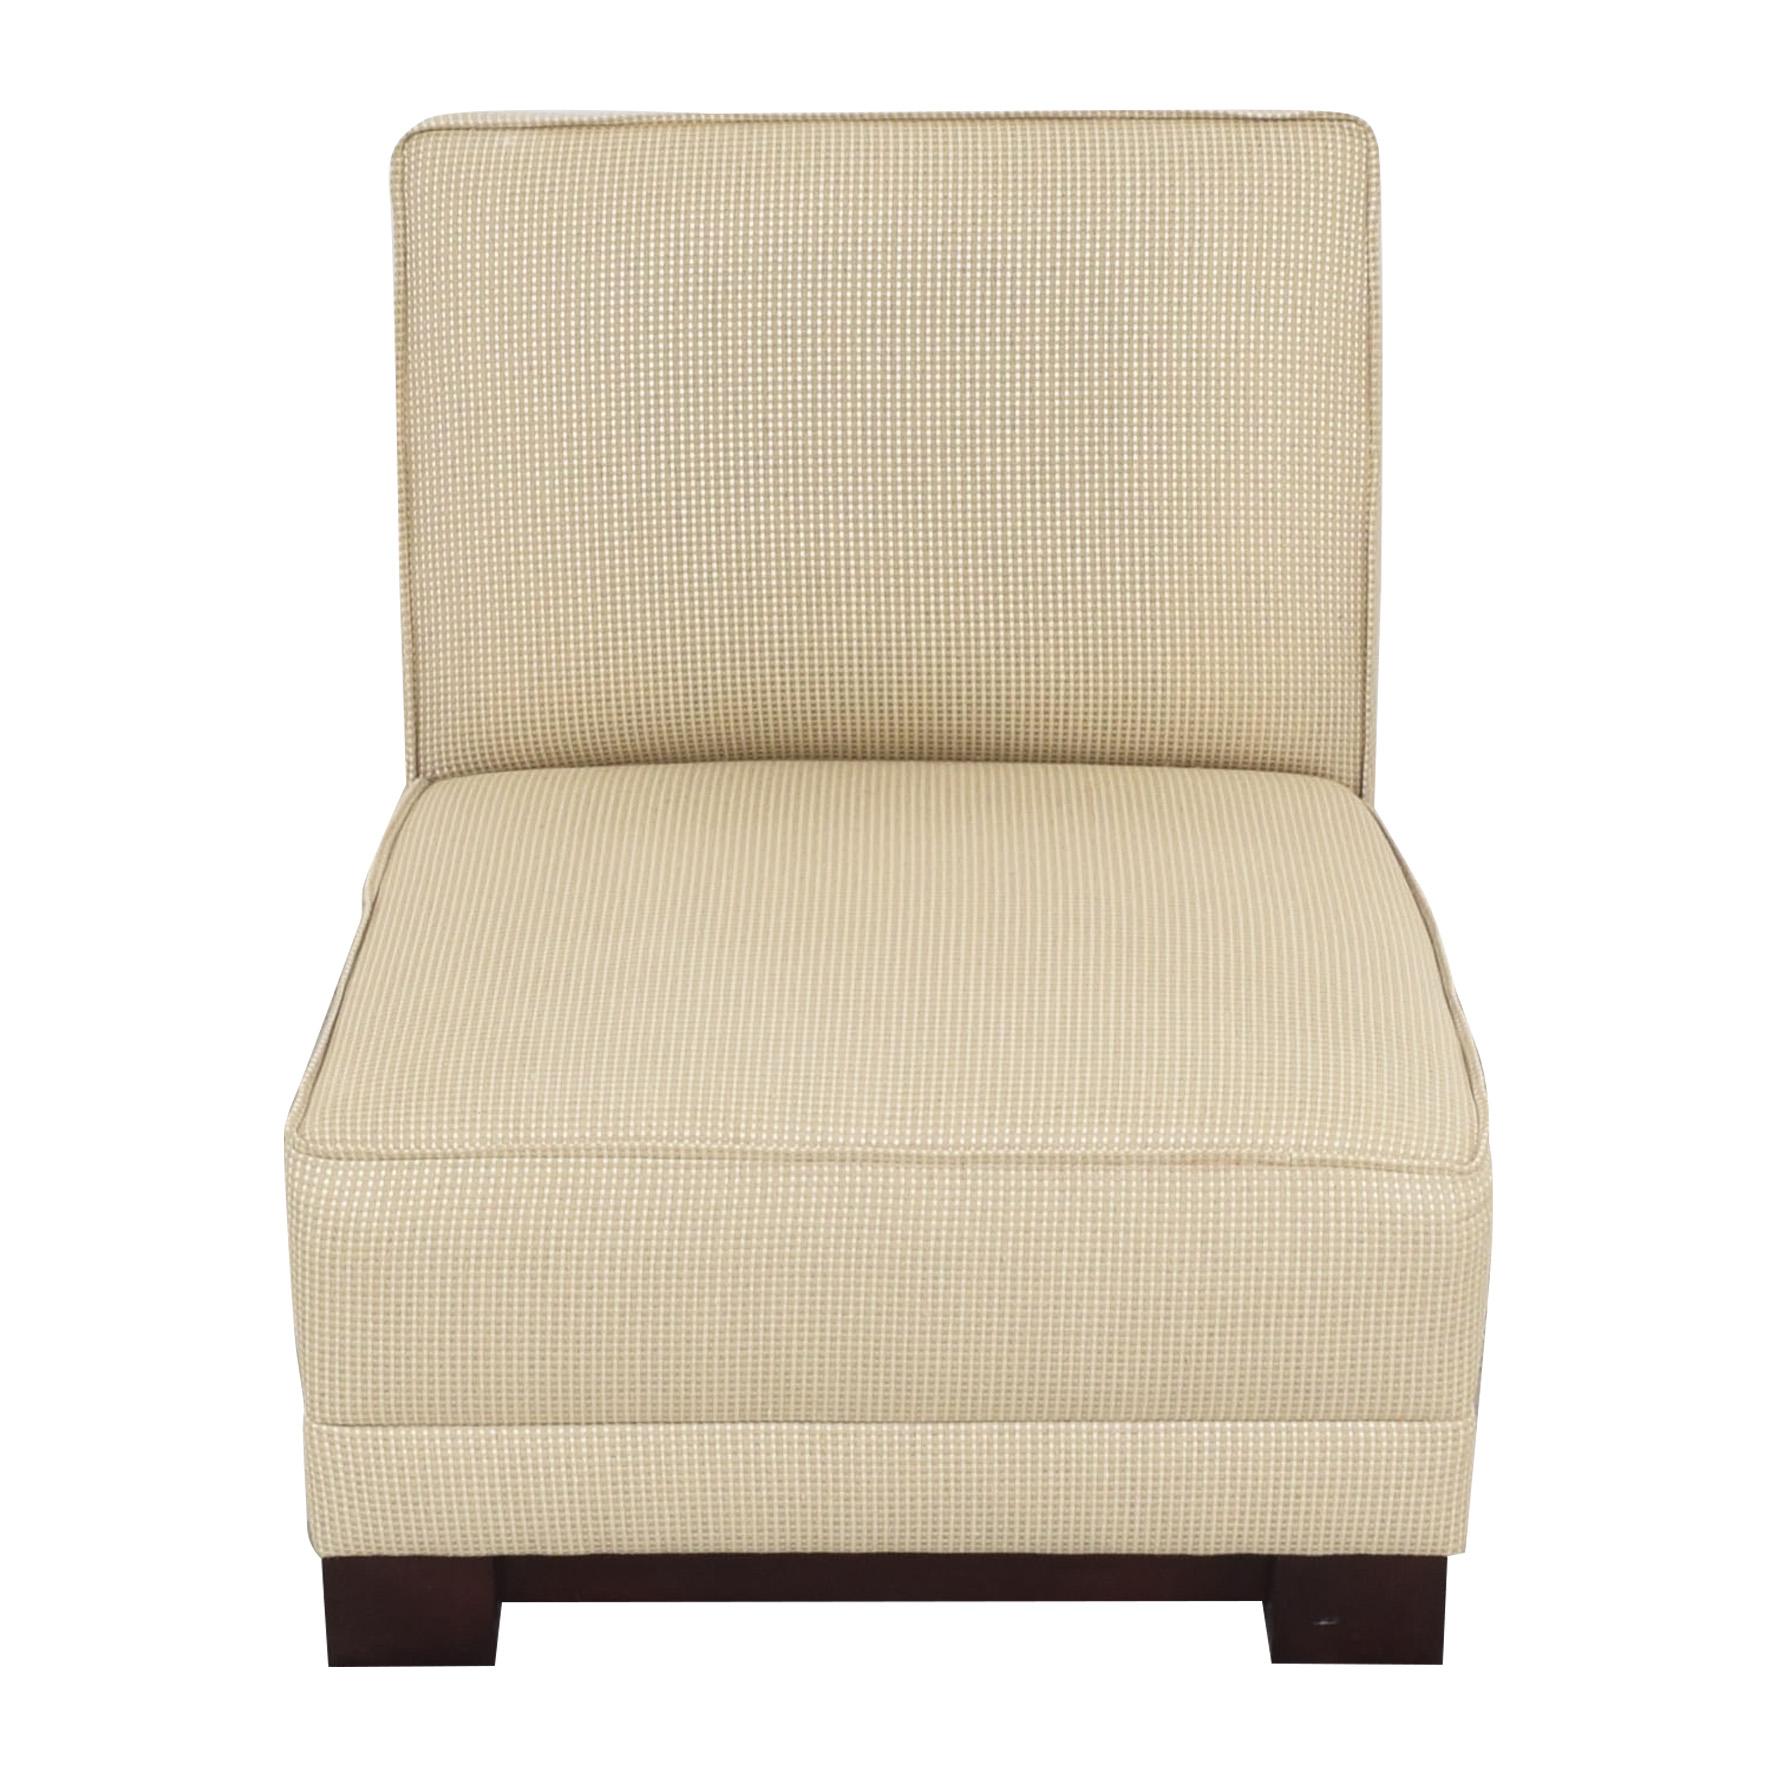 Ralph Lauren Home Ralph Lauren Home Hasley Slipper Chair ct